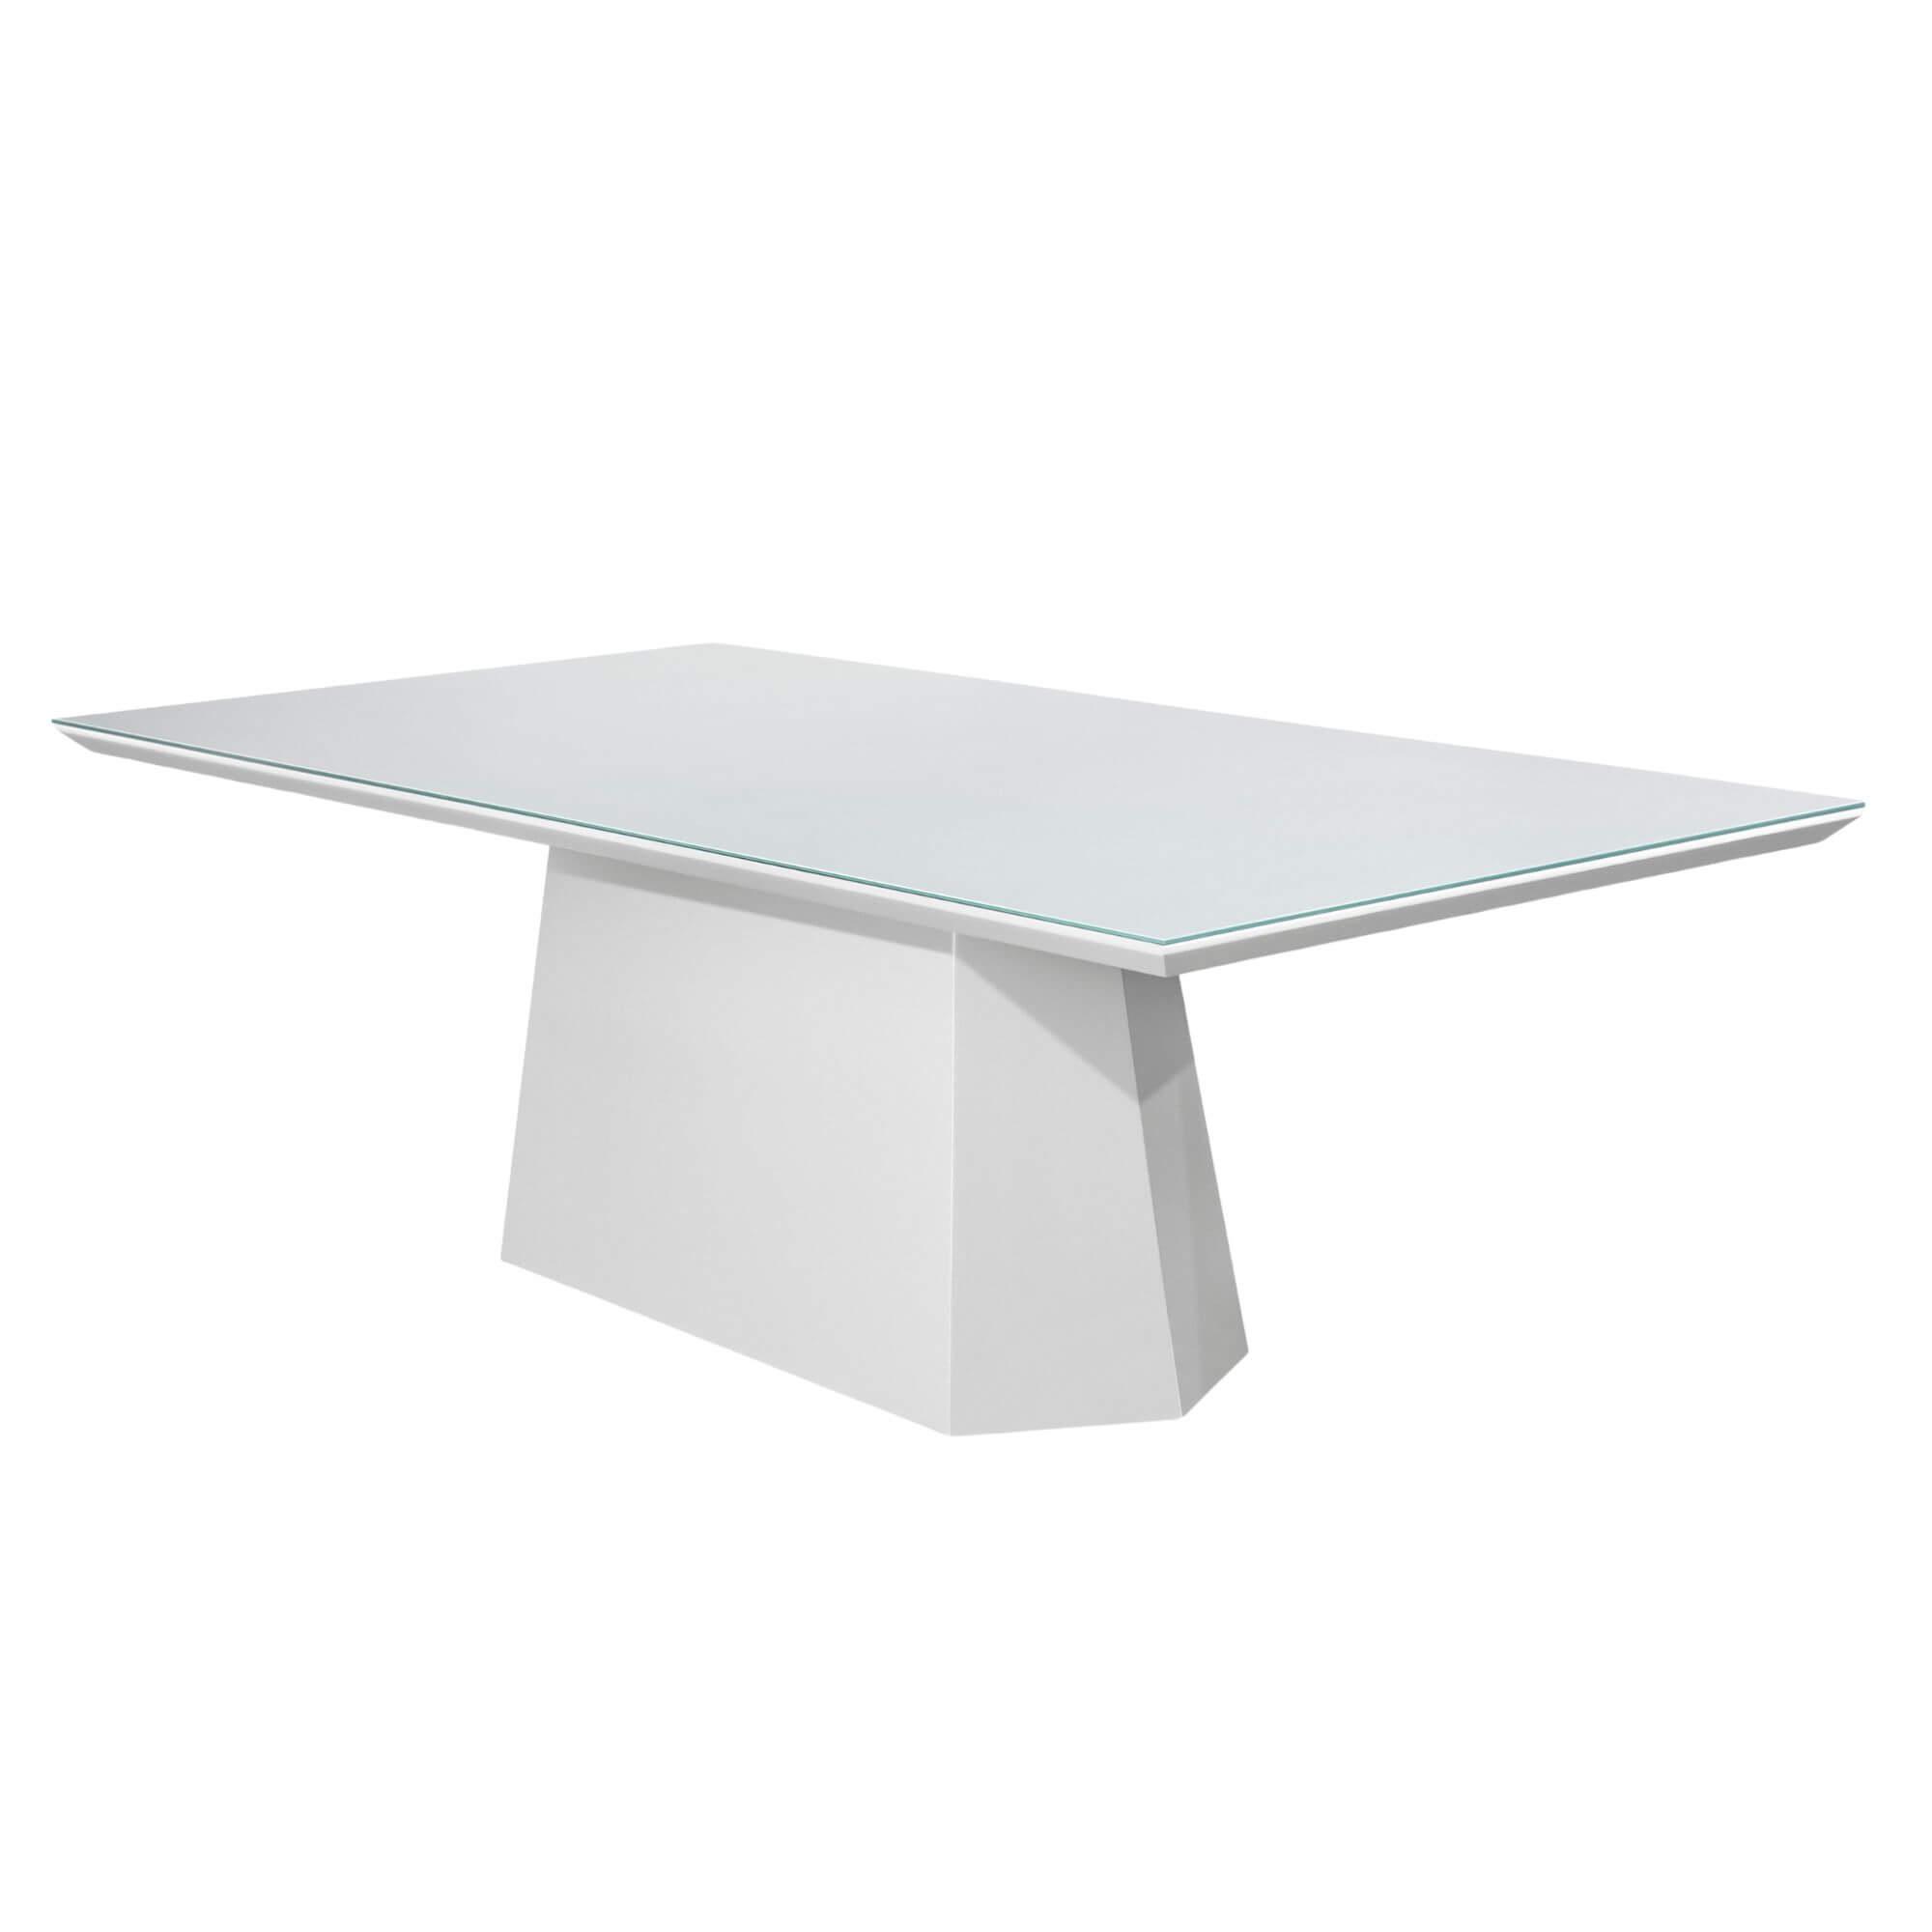 Mesa de Jantar Rainha Laca Branca e Vidro